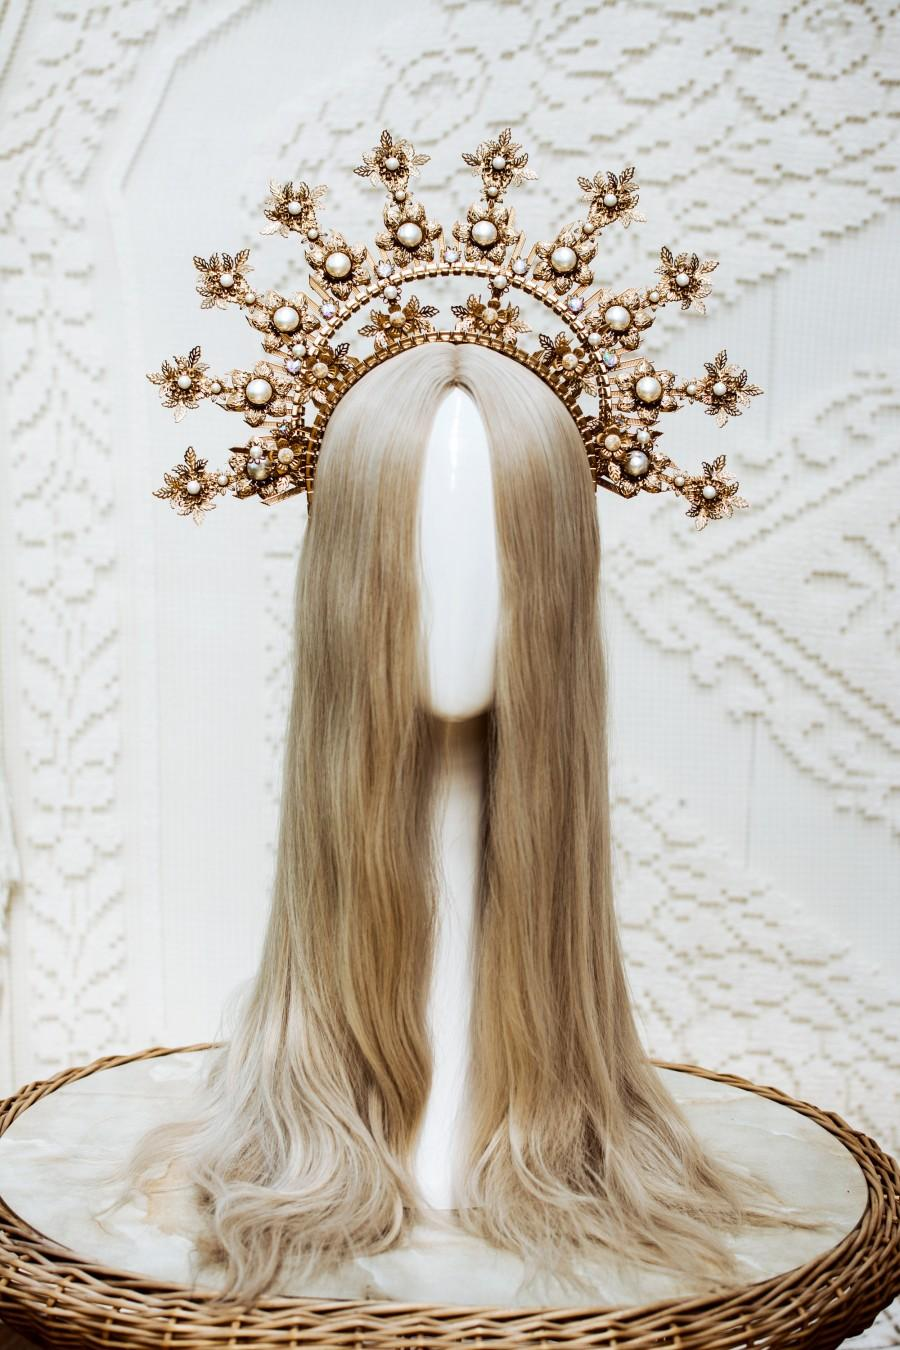 Свадьба - Gold Halo crown, Glitter Halo Headpiece, Festival crown, Boho Wedding, Met Gala Crown, Wedding Crown, Zip Tie Crown, Mary Crown, Boho Crown